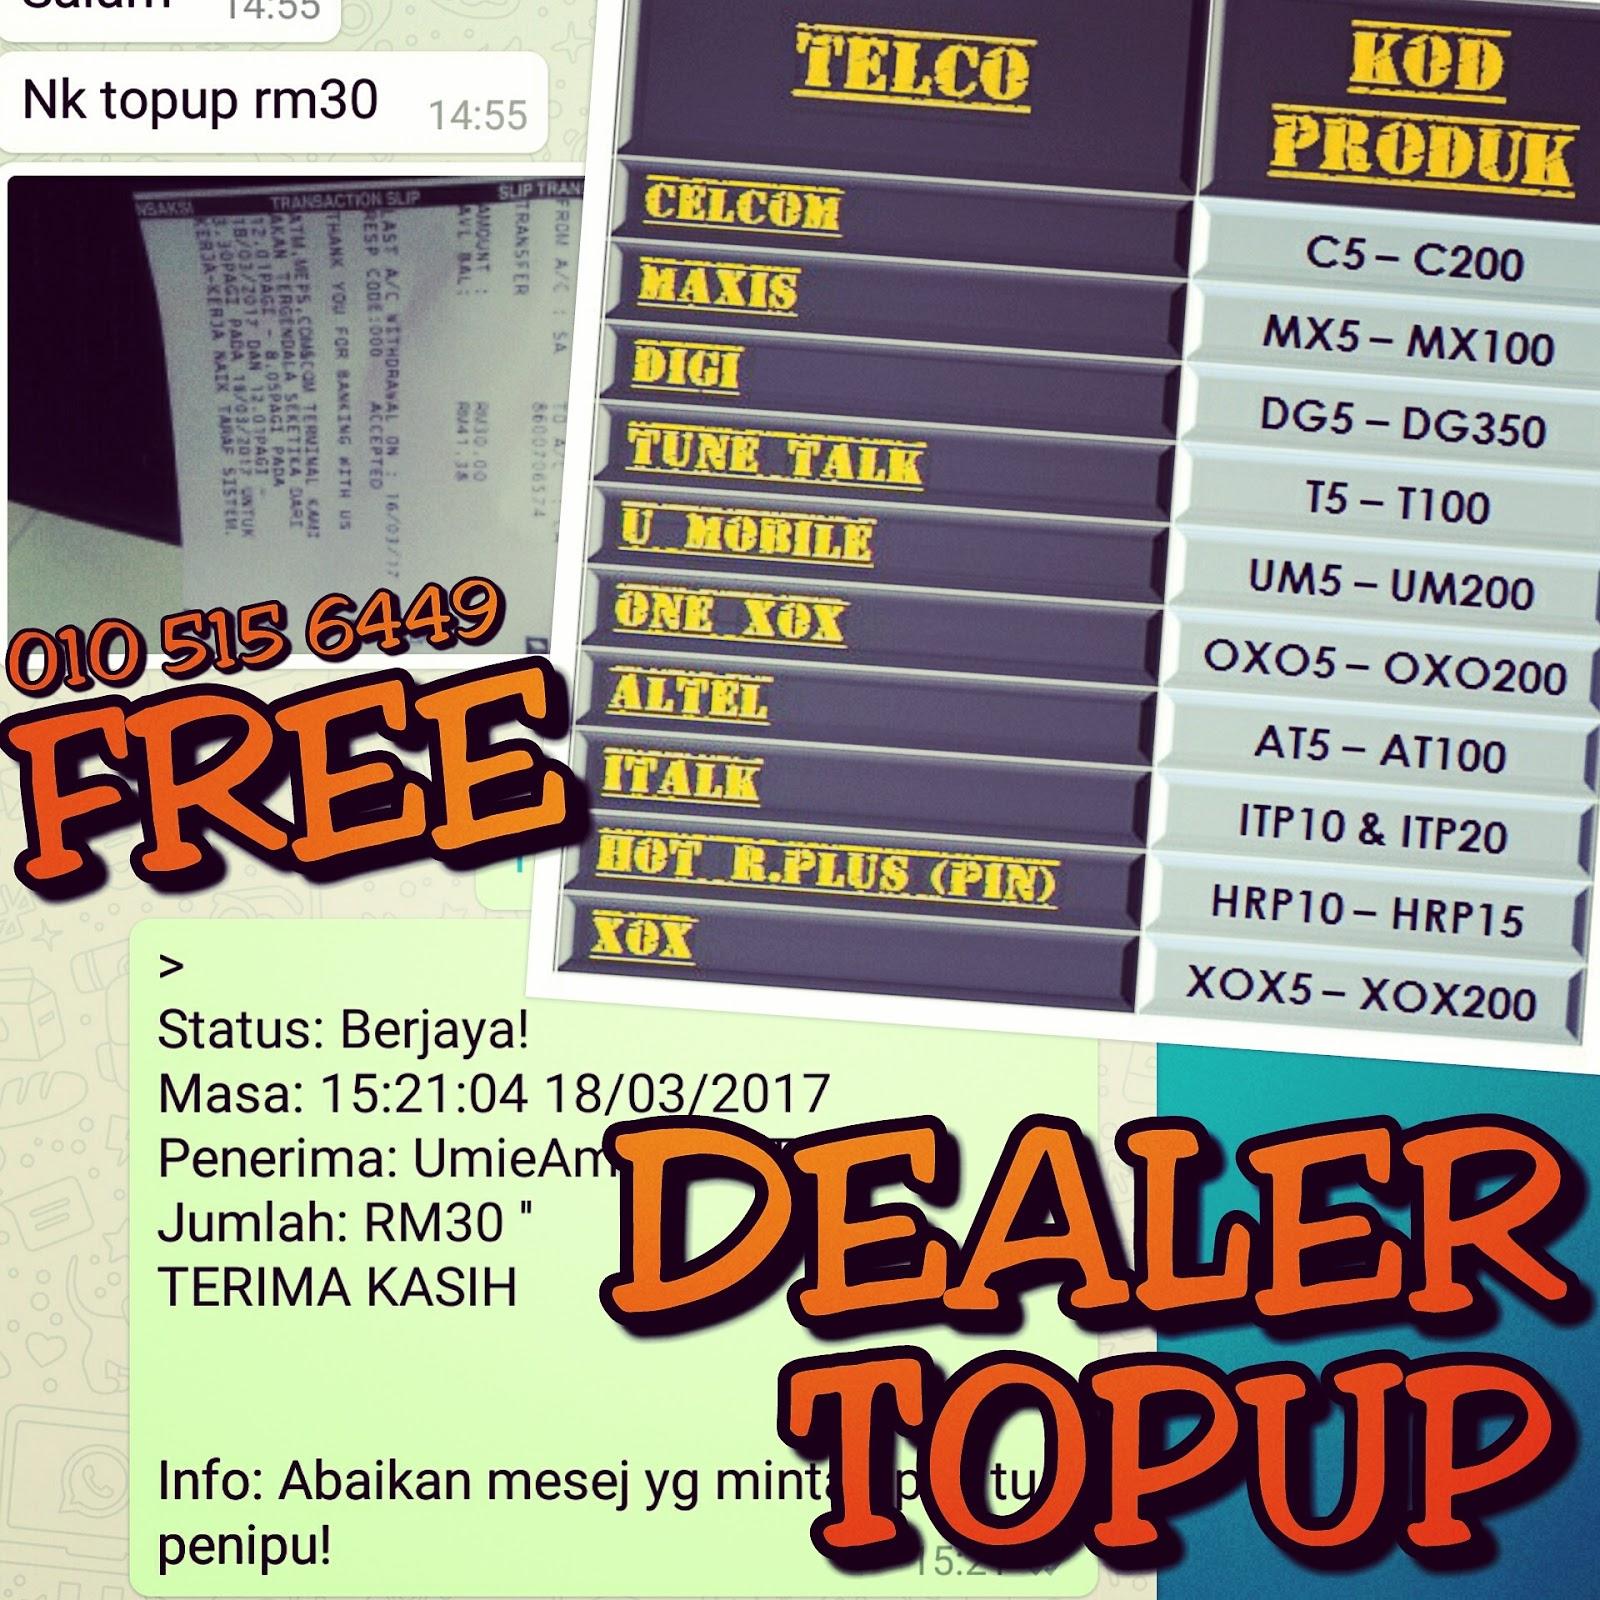 Rating: telegram 18+ channel malaysia